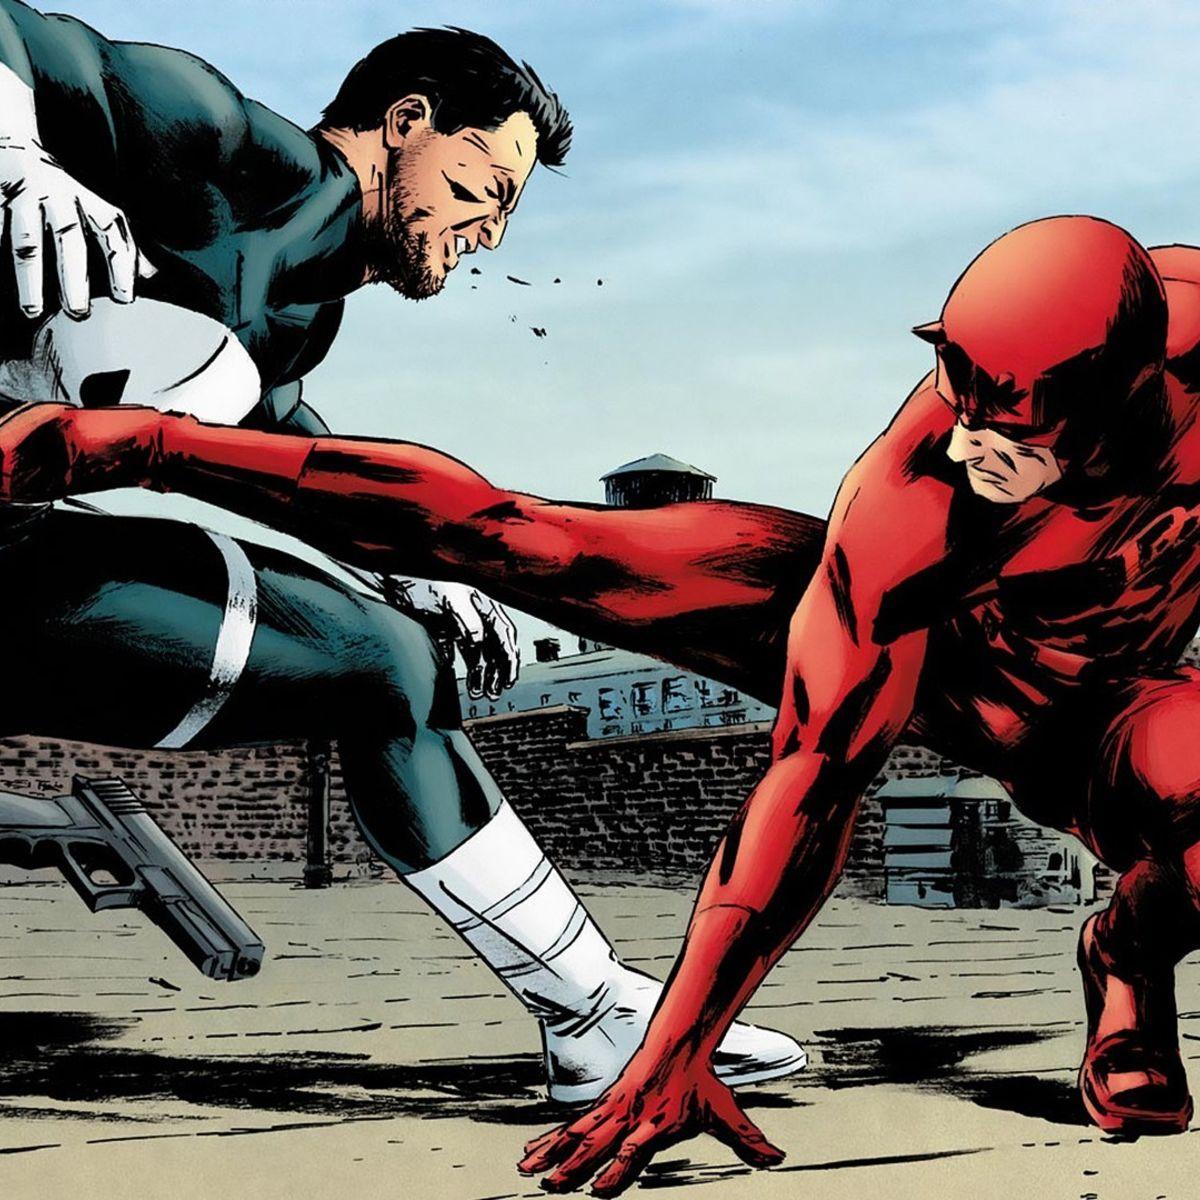 daredevil-the-punisher-comics-2678420-1920x1080.jpg